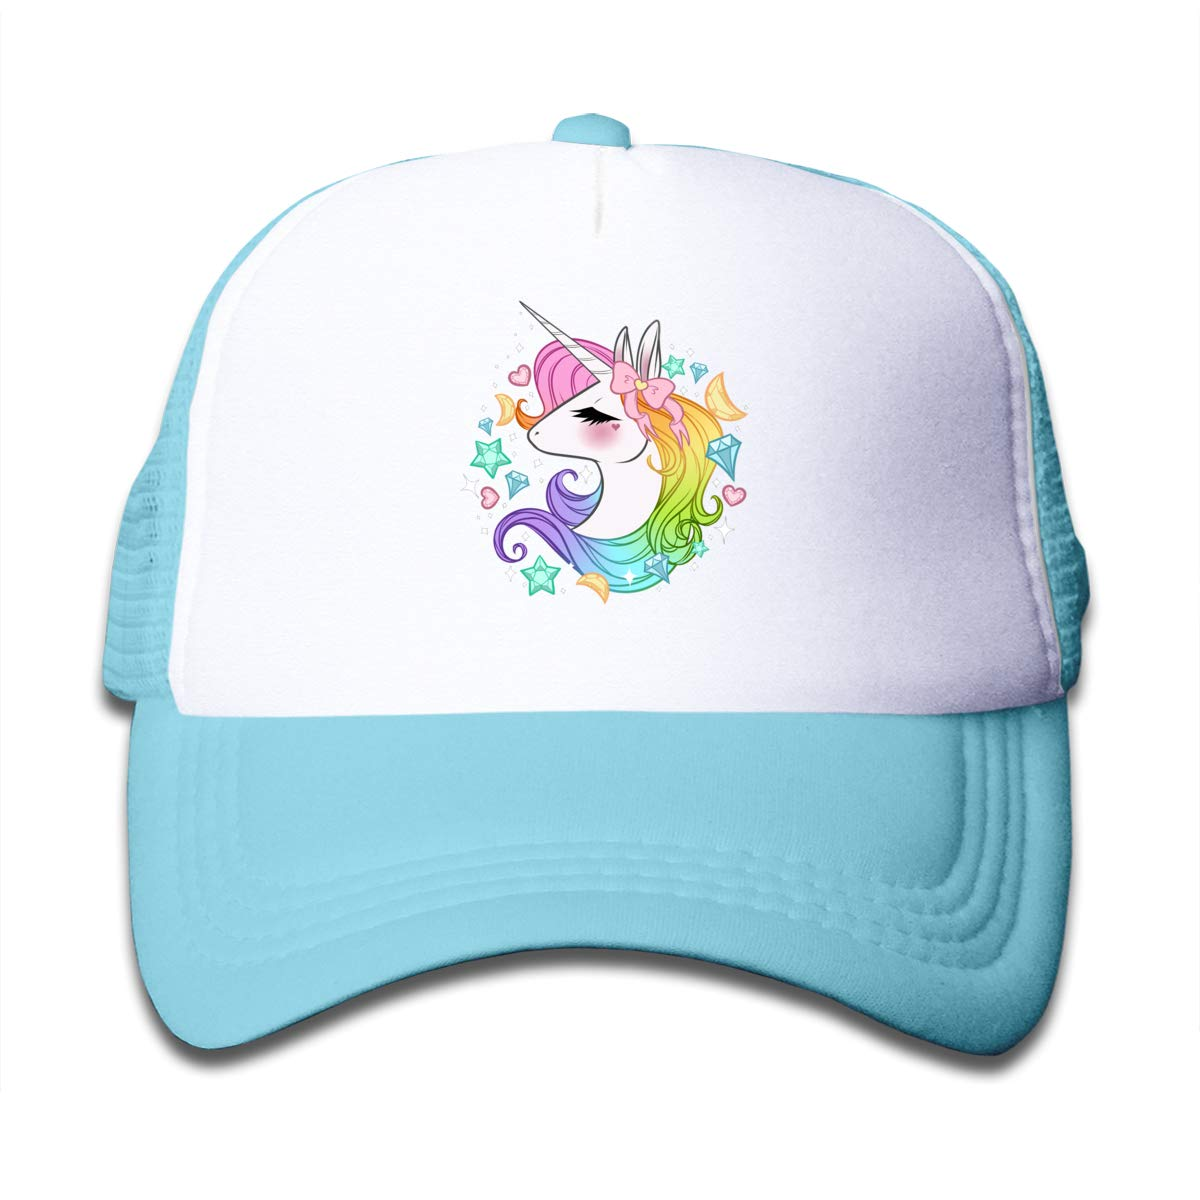 Waldeal Girls Cute Unicorns Kids Mesh Trucker Caps Adjustable Snapback Hat SkyBlue